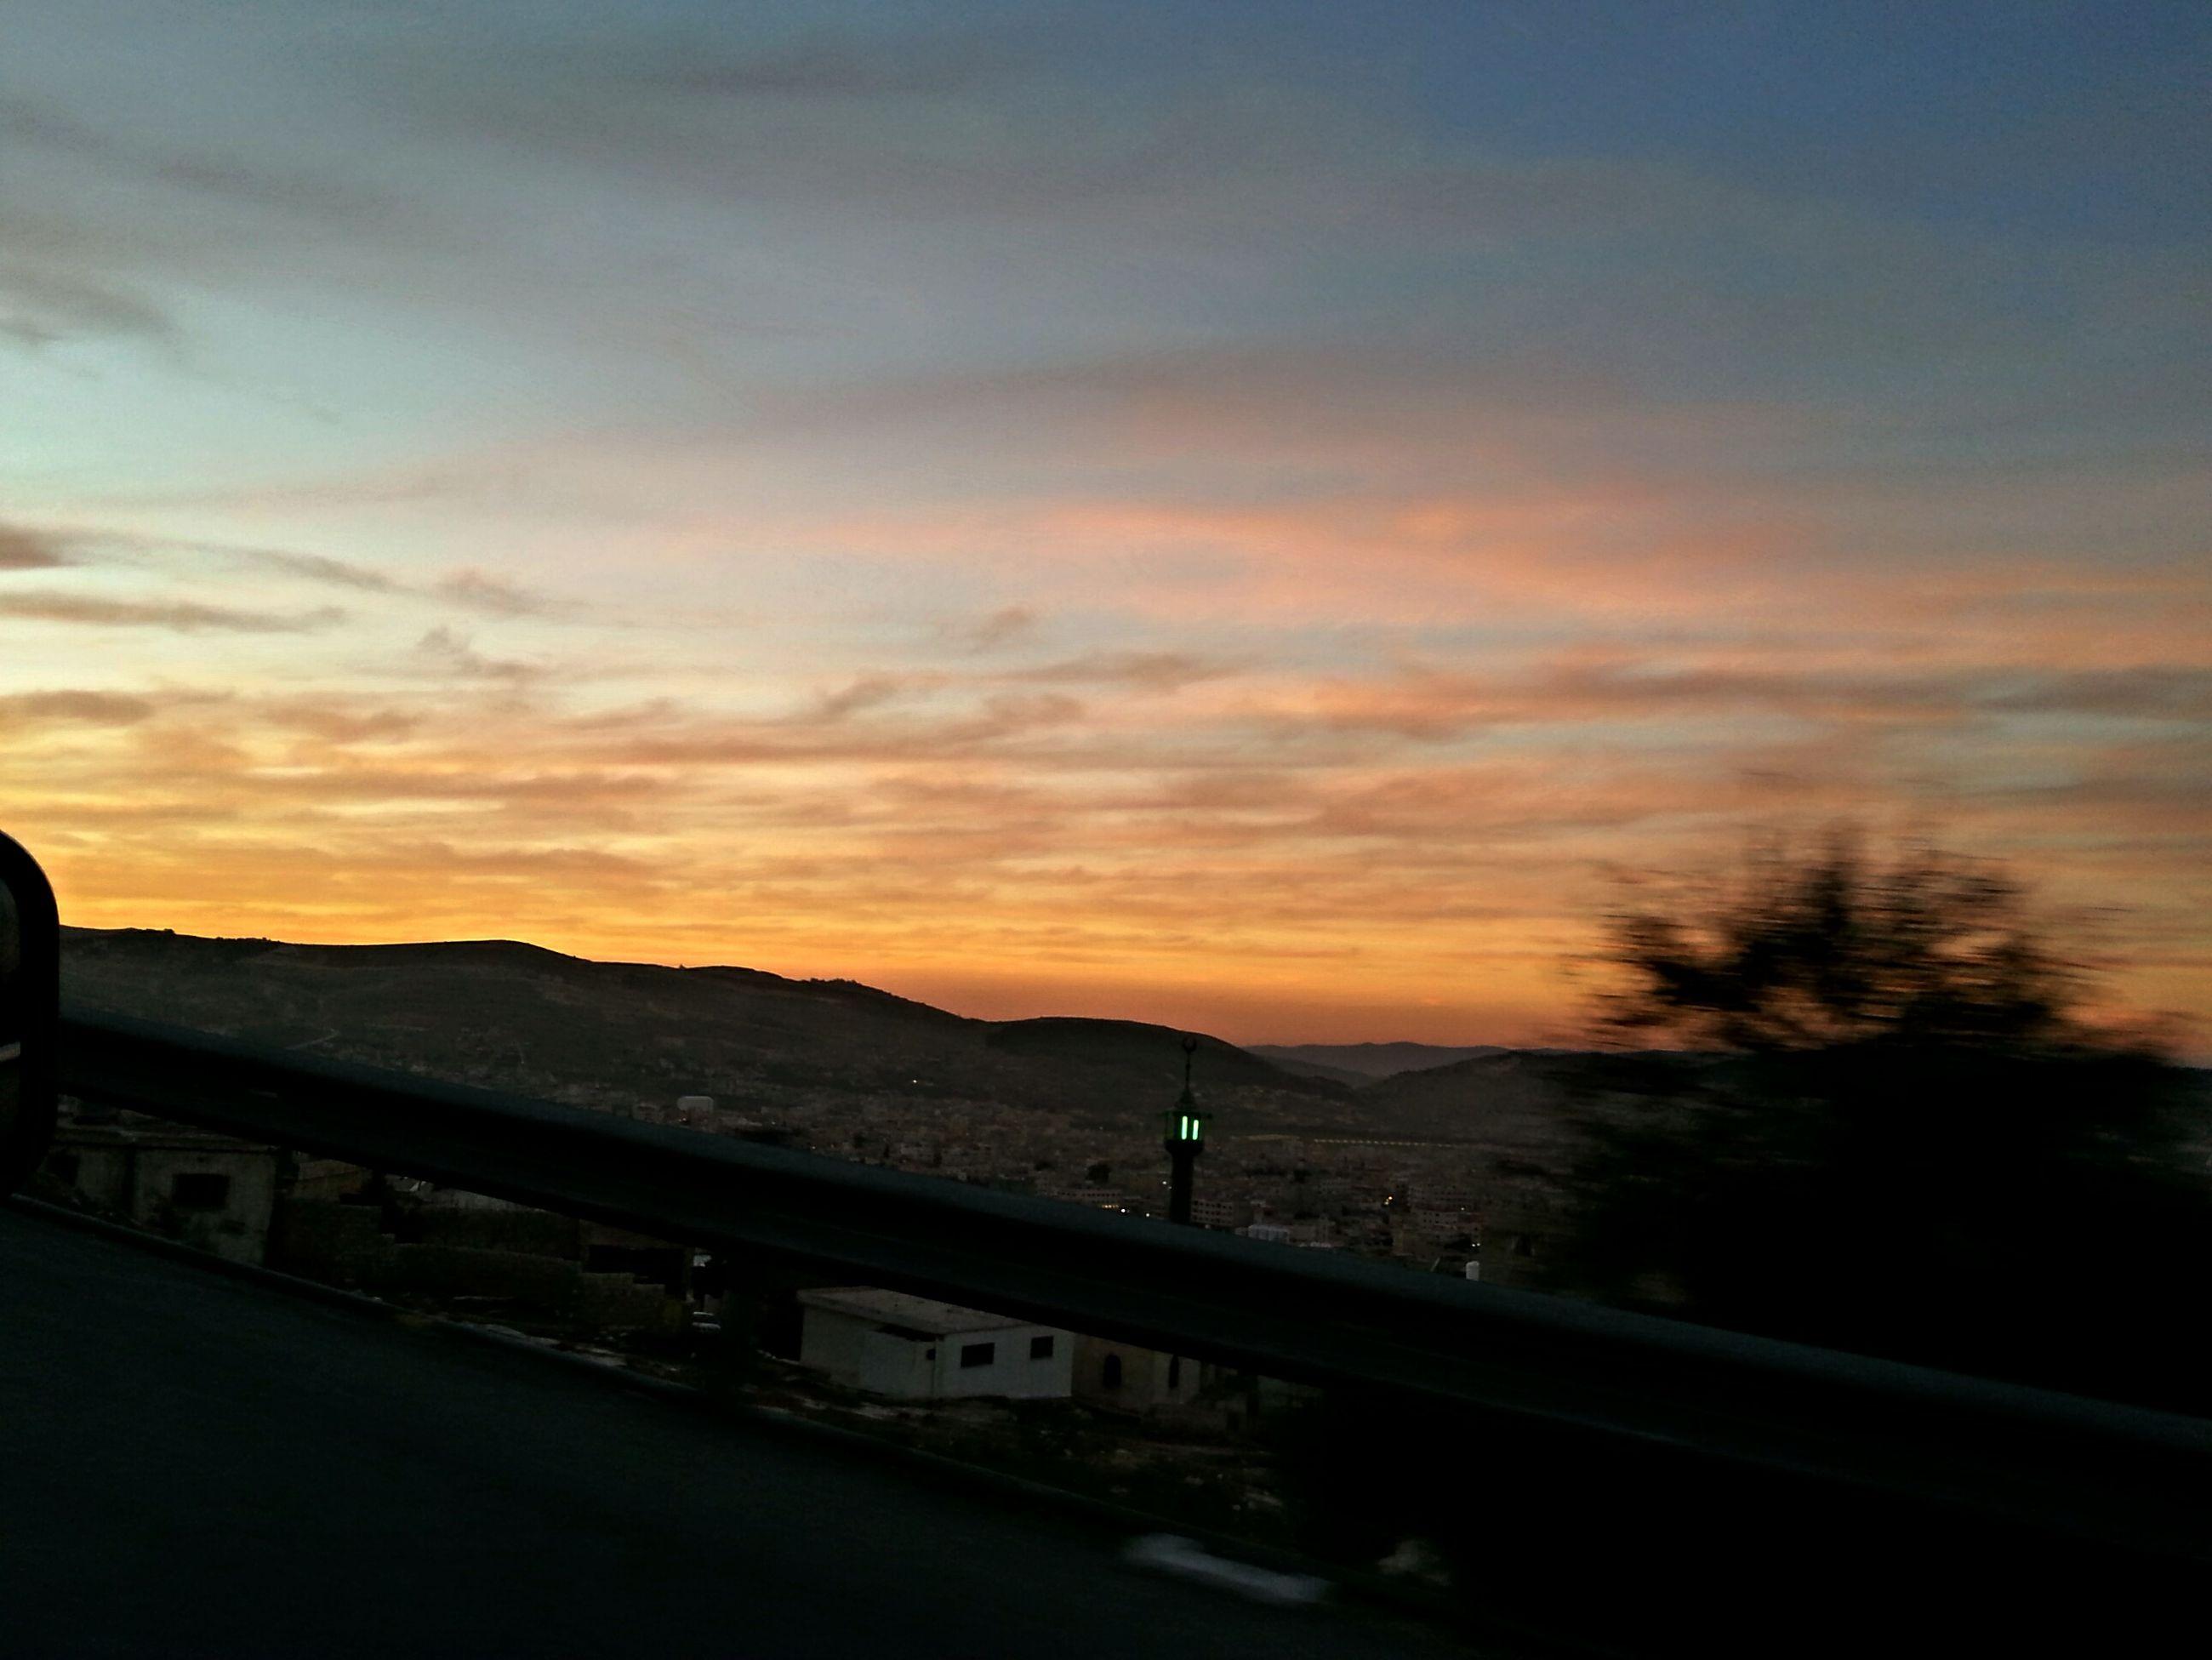 sunset, sky, orange color, silhouette, mountain, scenics, transportation, beauty in nature, cloud - sky, tranquil scene, tranquility, nature, landscape, road, cloud, railing, idyllic, dusk, dramatic sky, mountain range